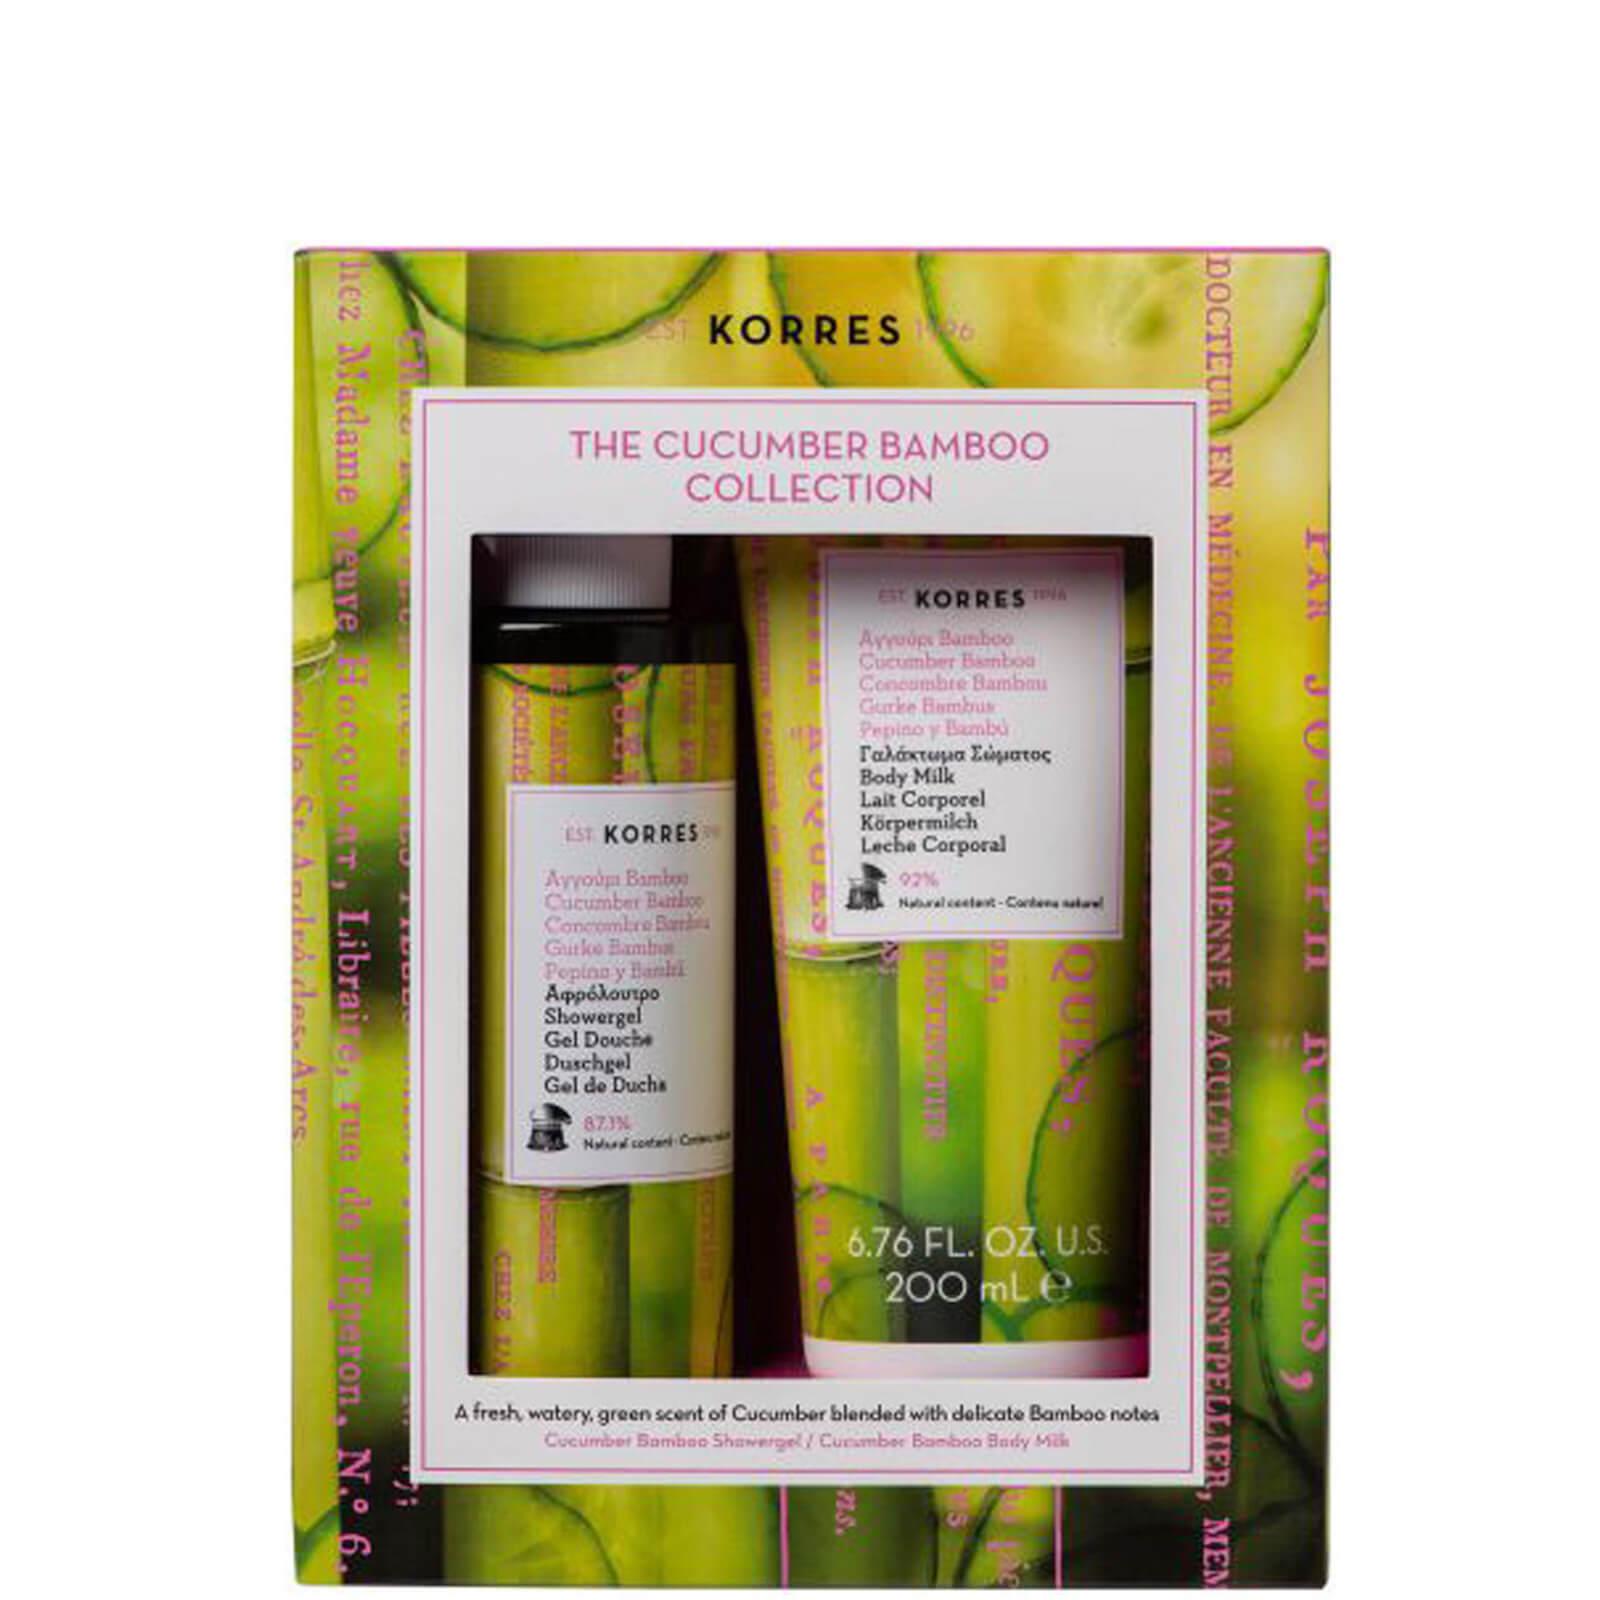 Купить Korres Cucumber and Bamboo Bath and Body Set